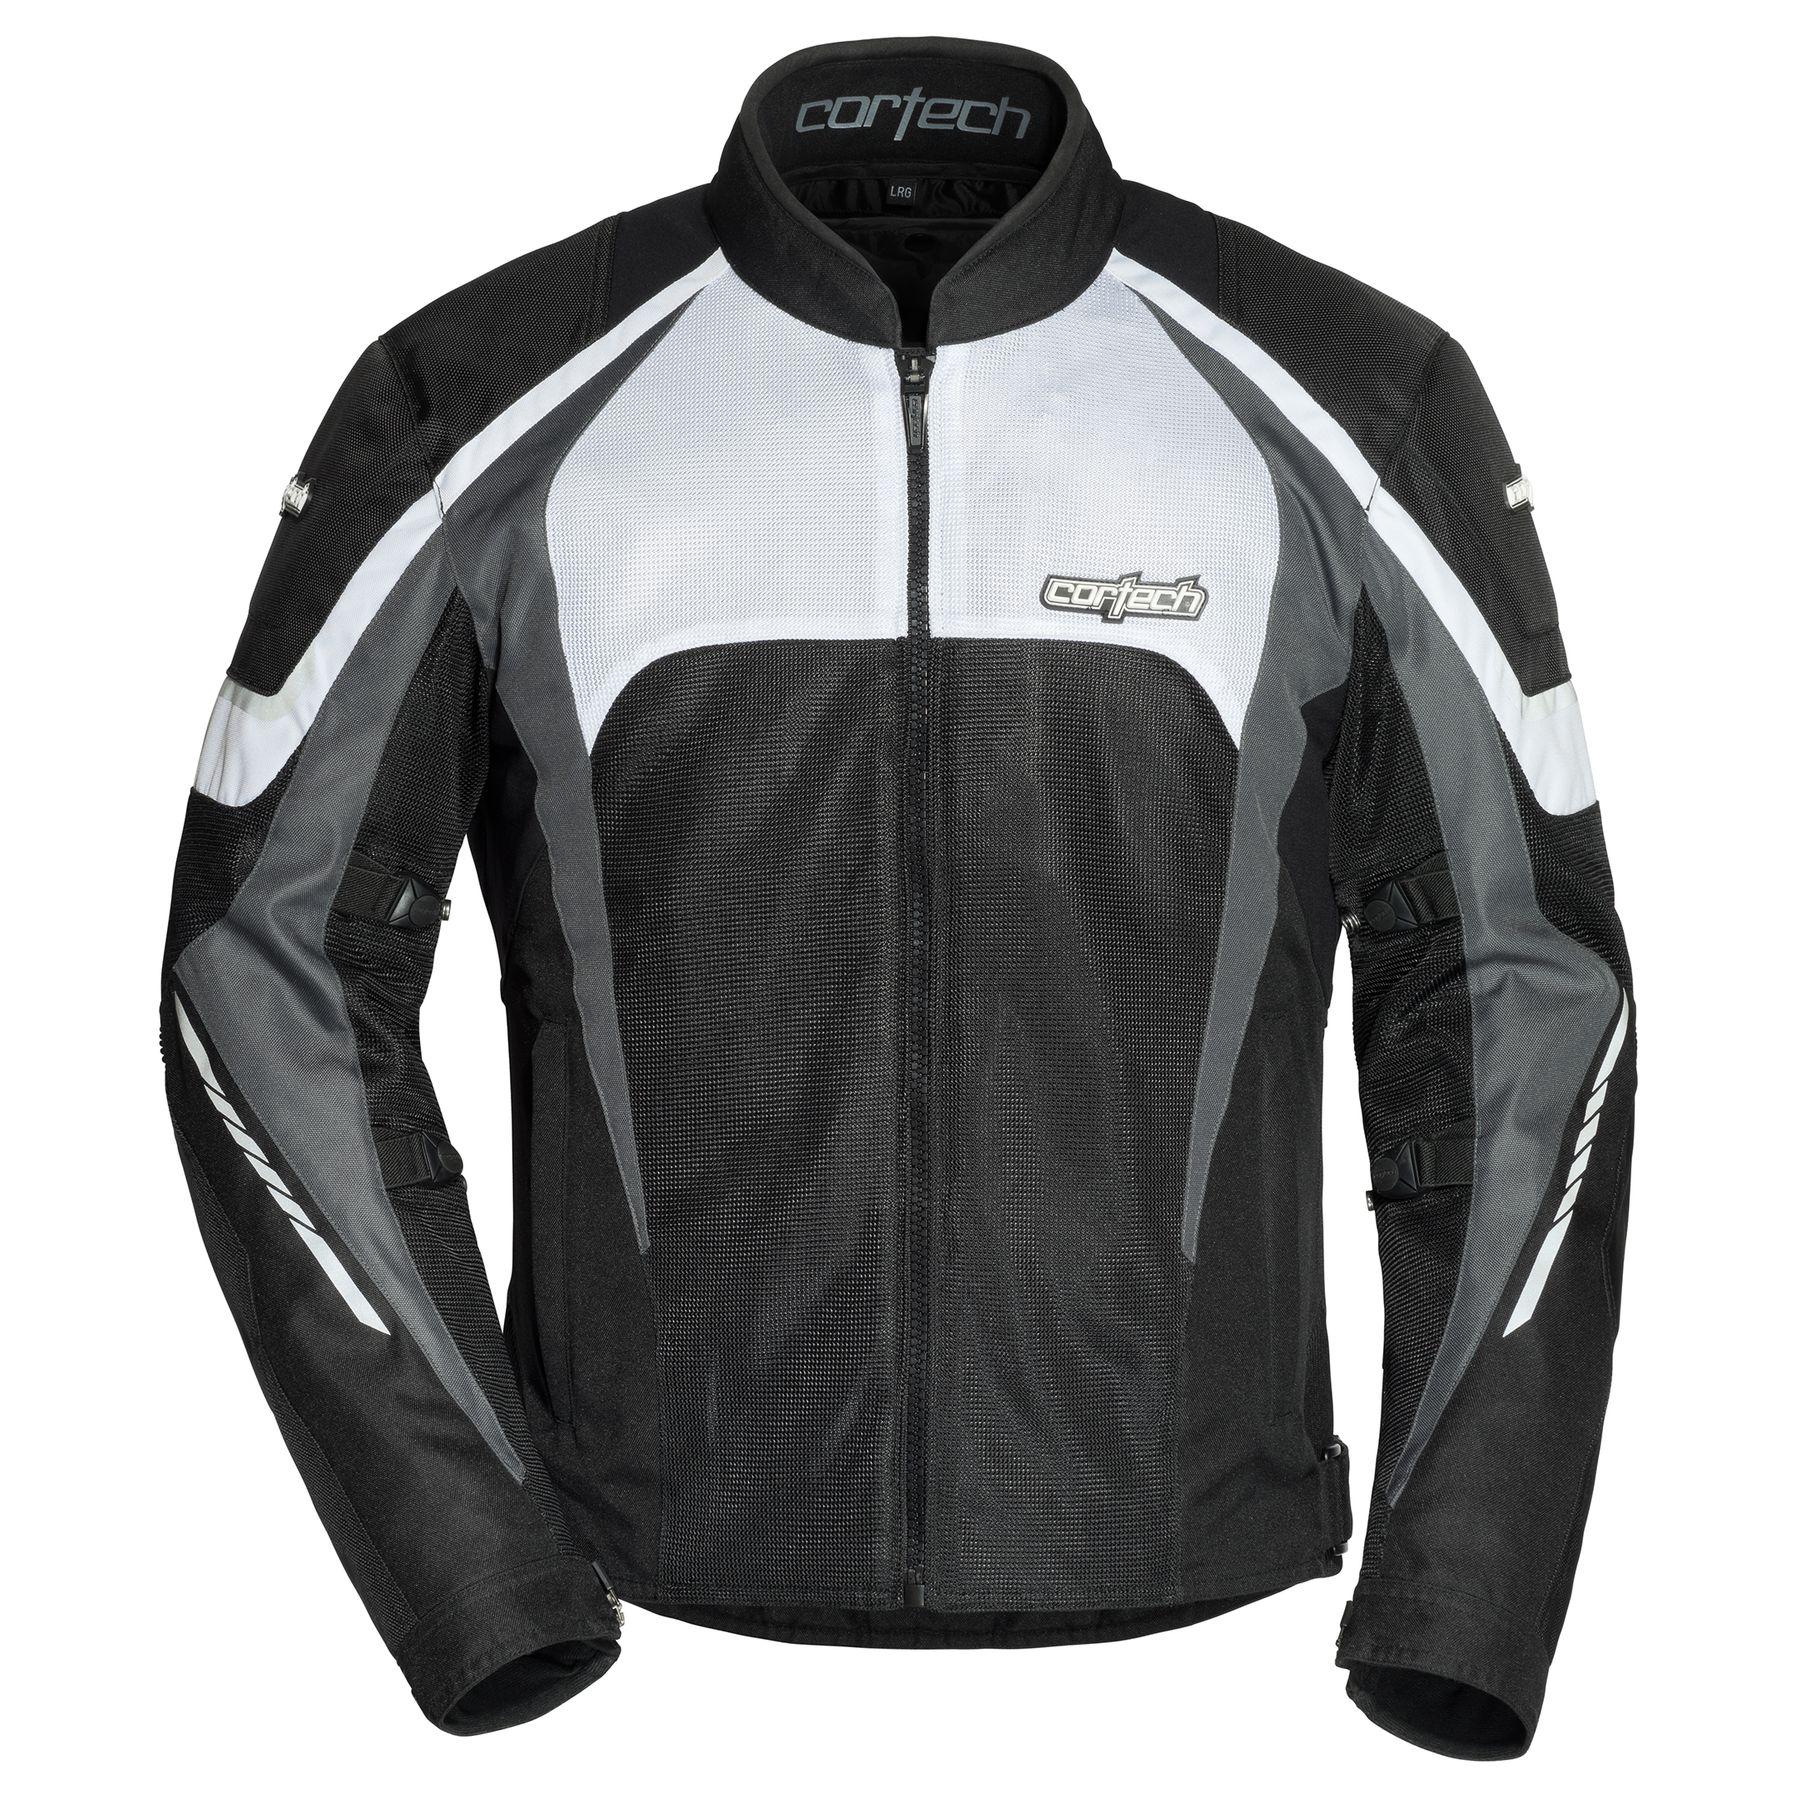 Cortech GX Sport Air 5.0 Mens Jacket Black/Gunmetal